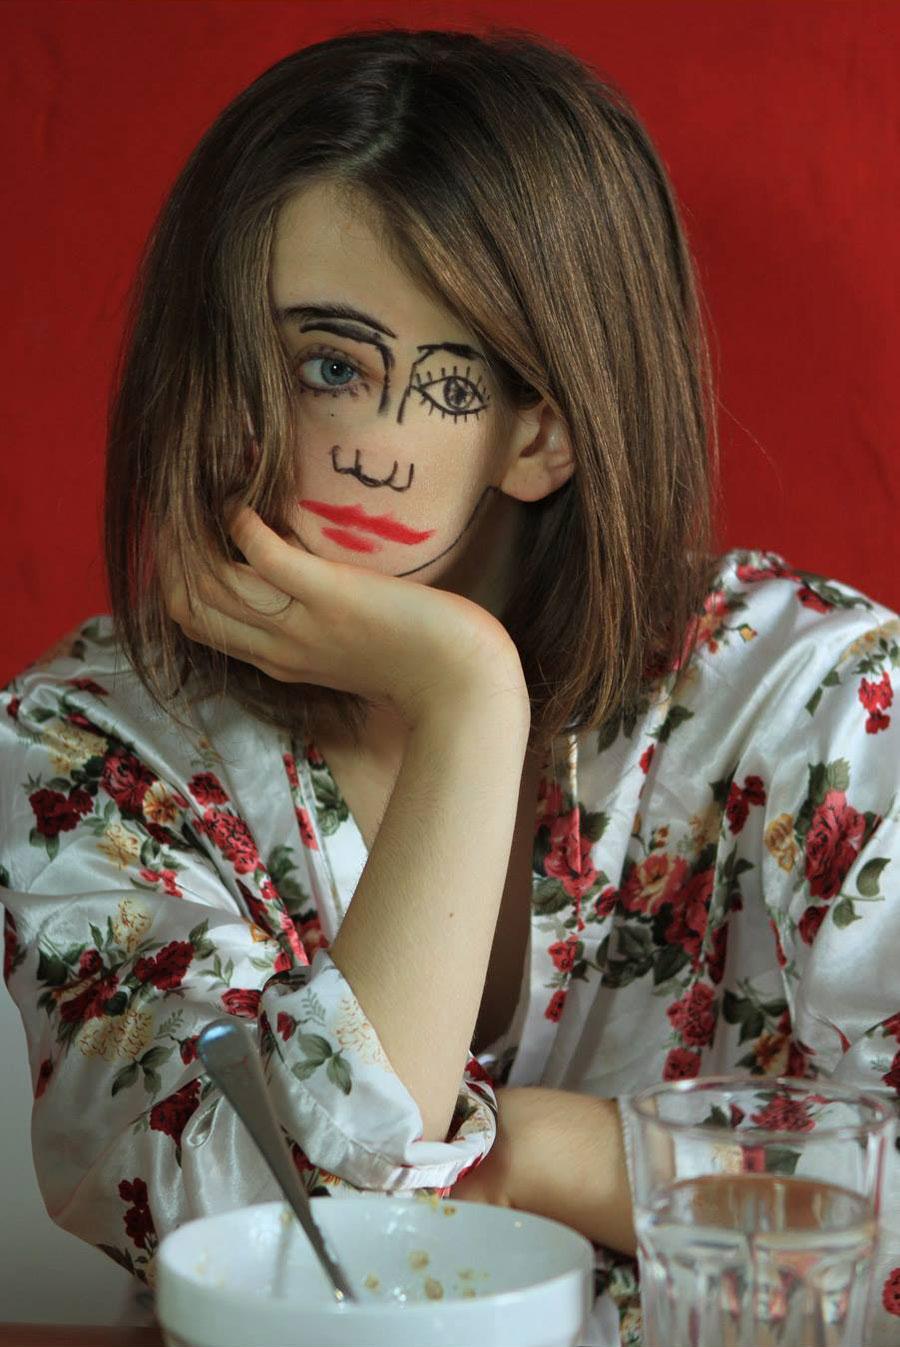 fotografia-arte-ritratti-ragazza-doppio-volto-doubleface-sebastian-Bieniek-07